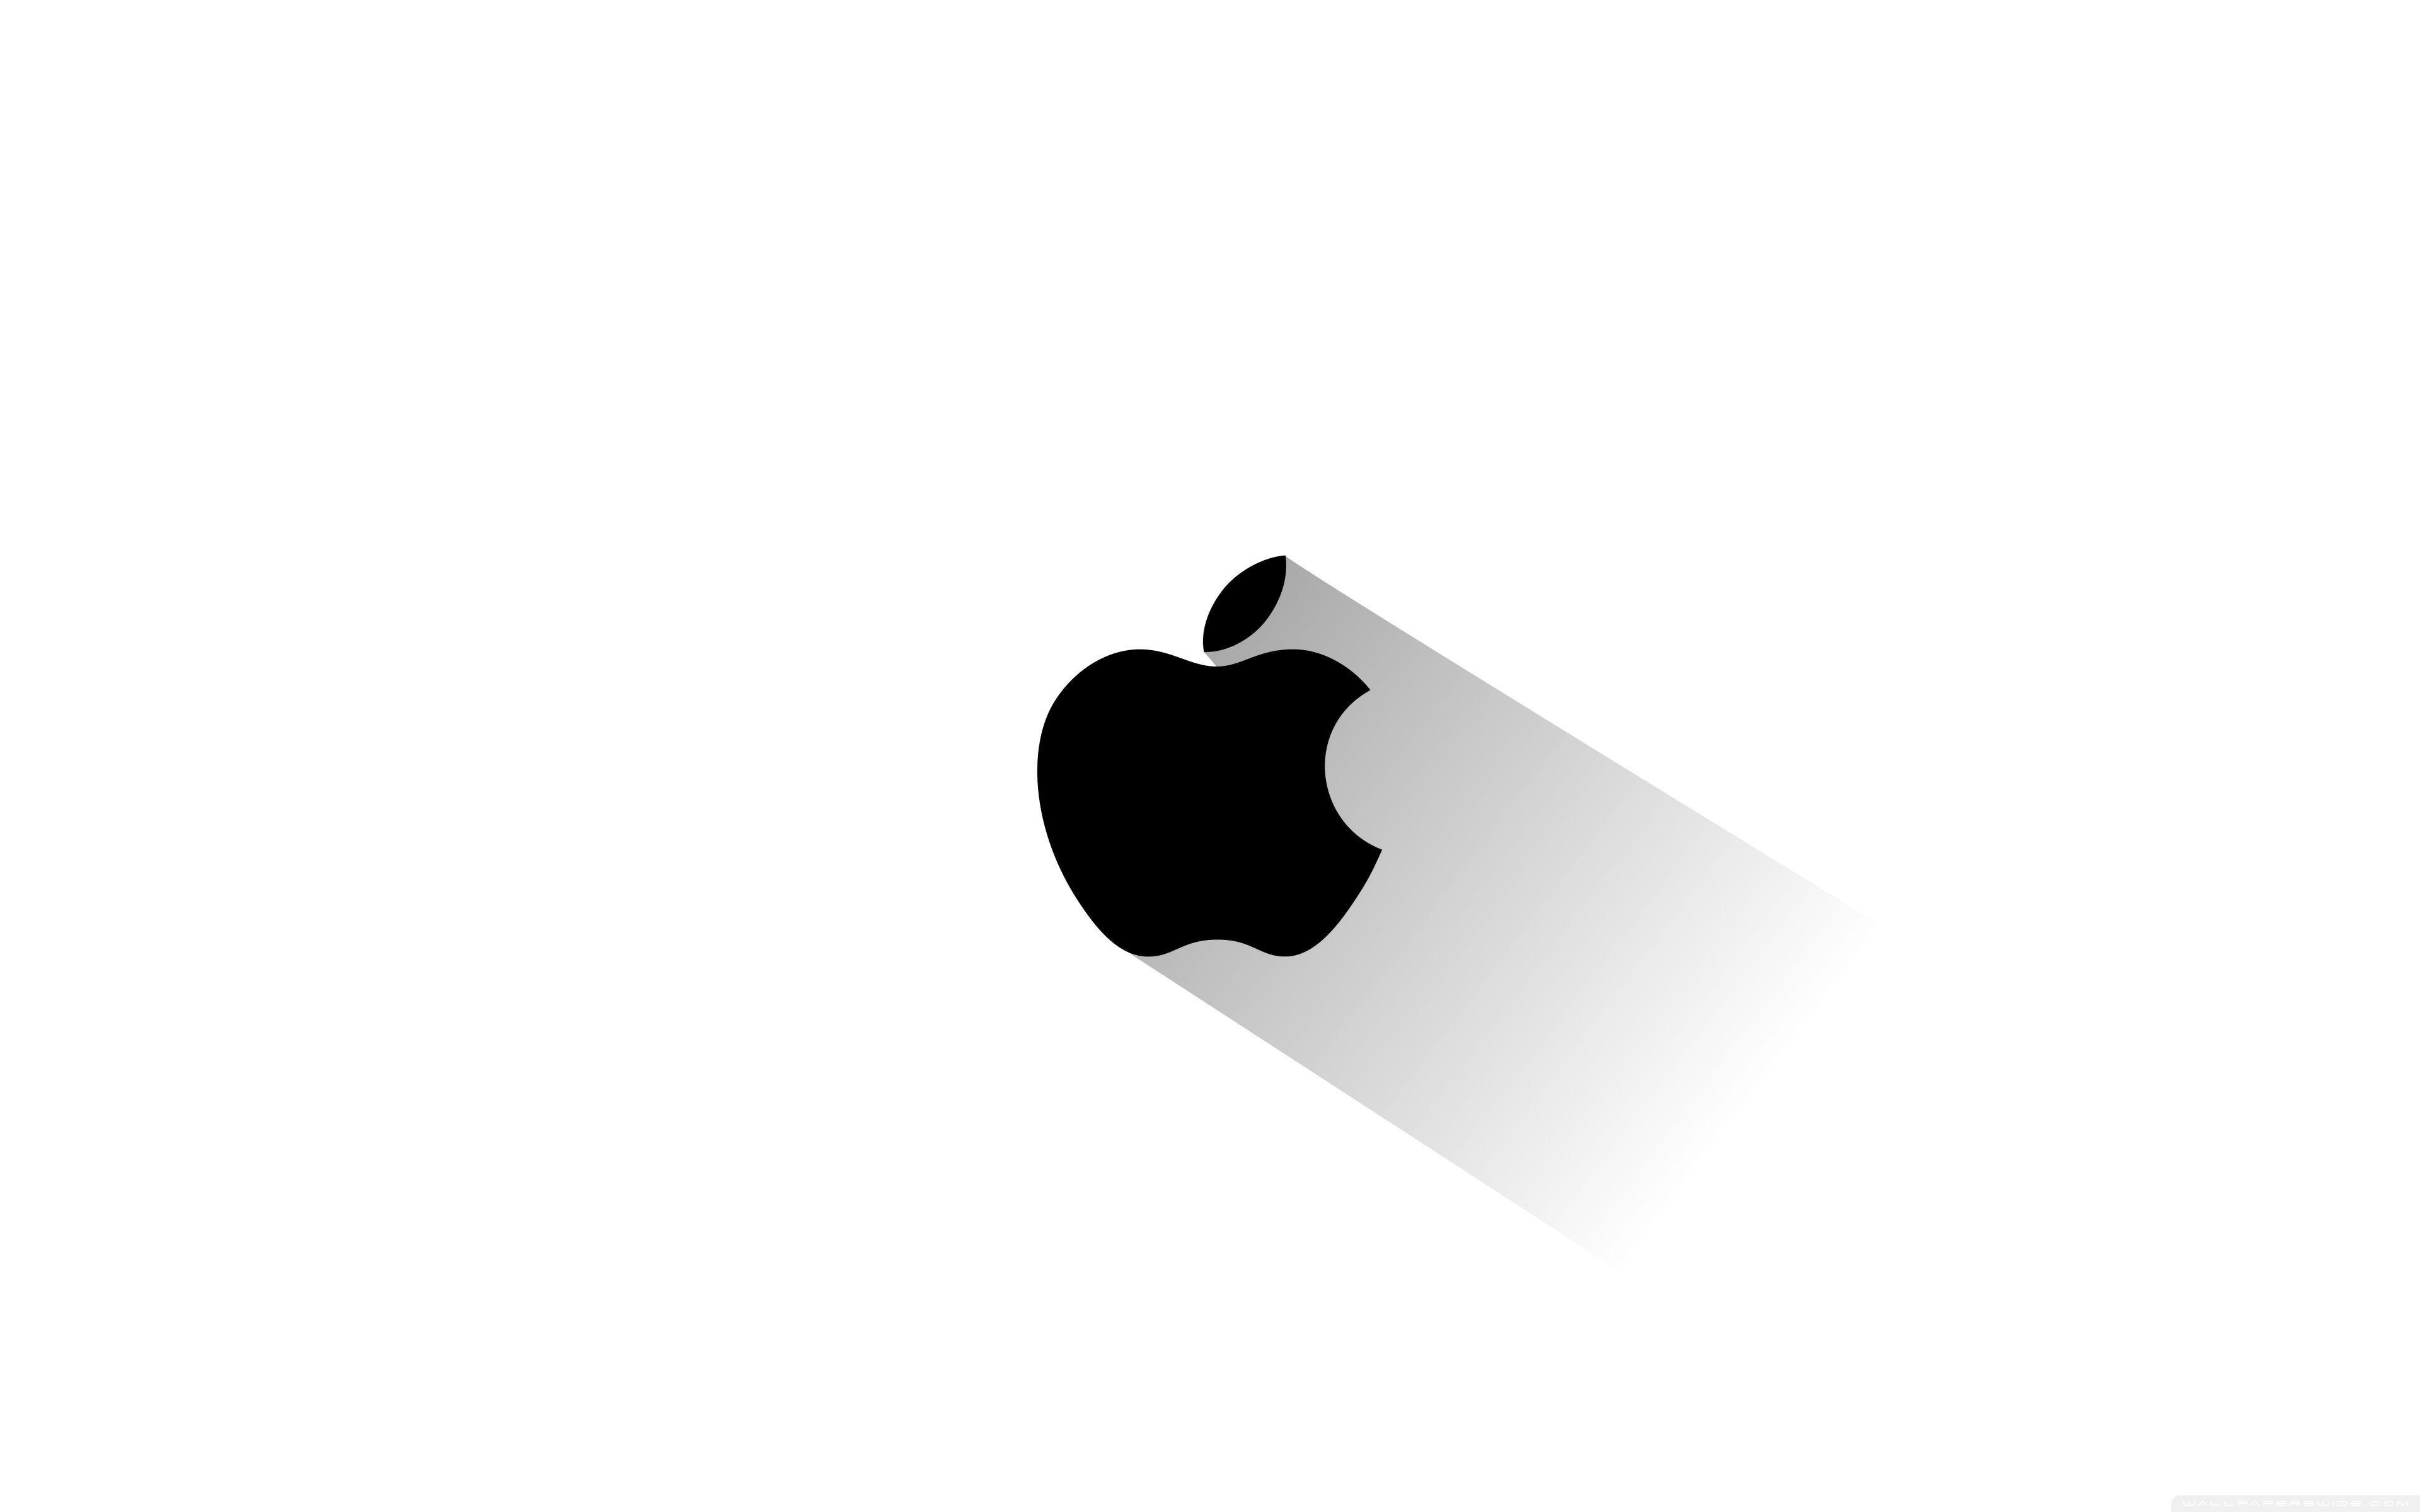 White Apple Logo Wallpapers Top Free White Apple Logo